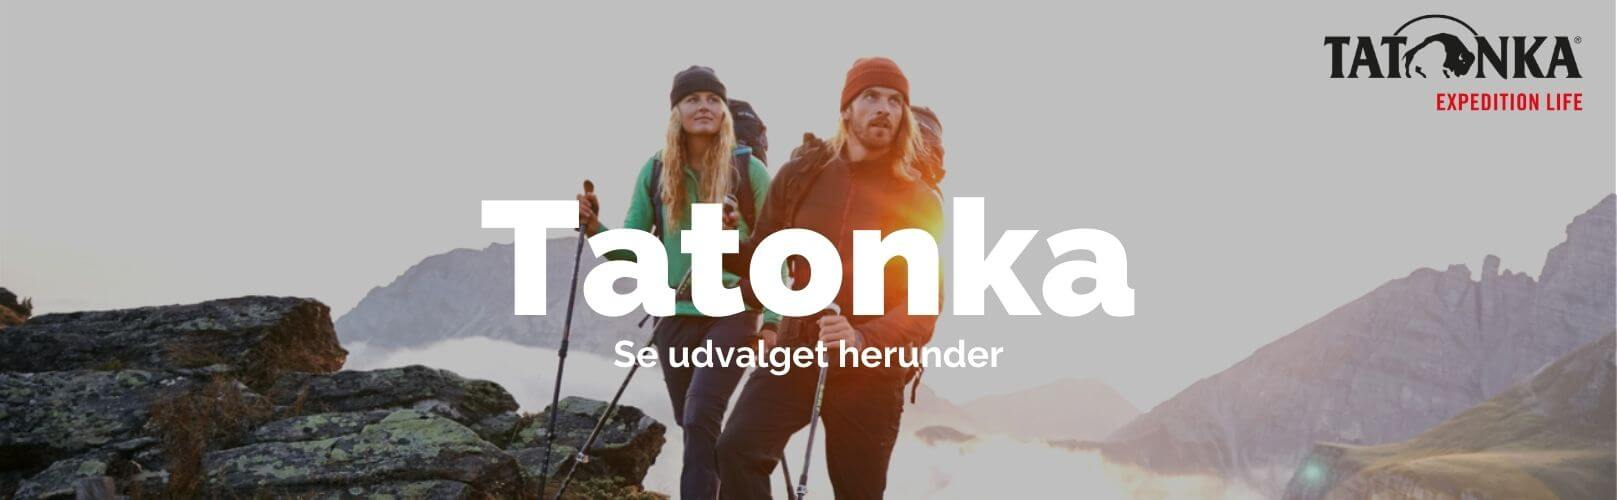 Tatonka outdoor banner